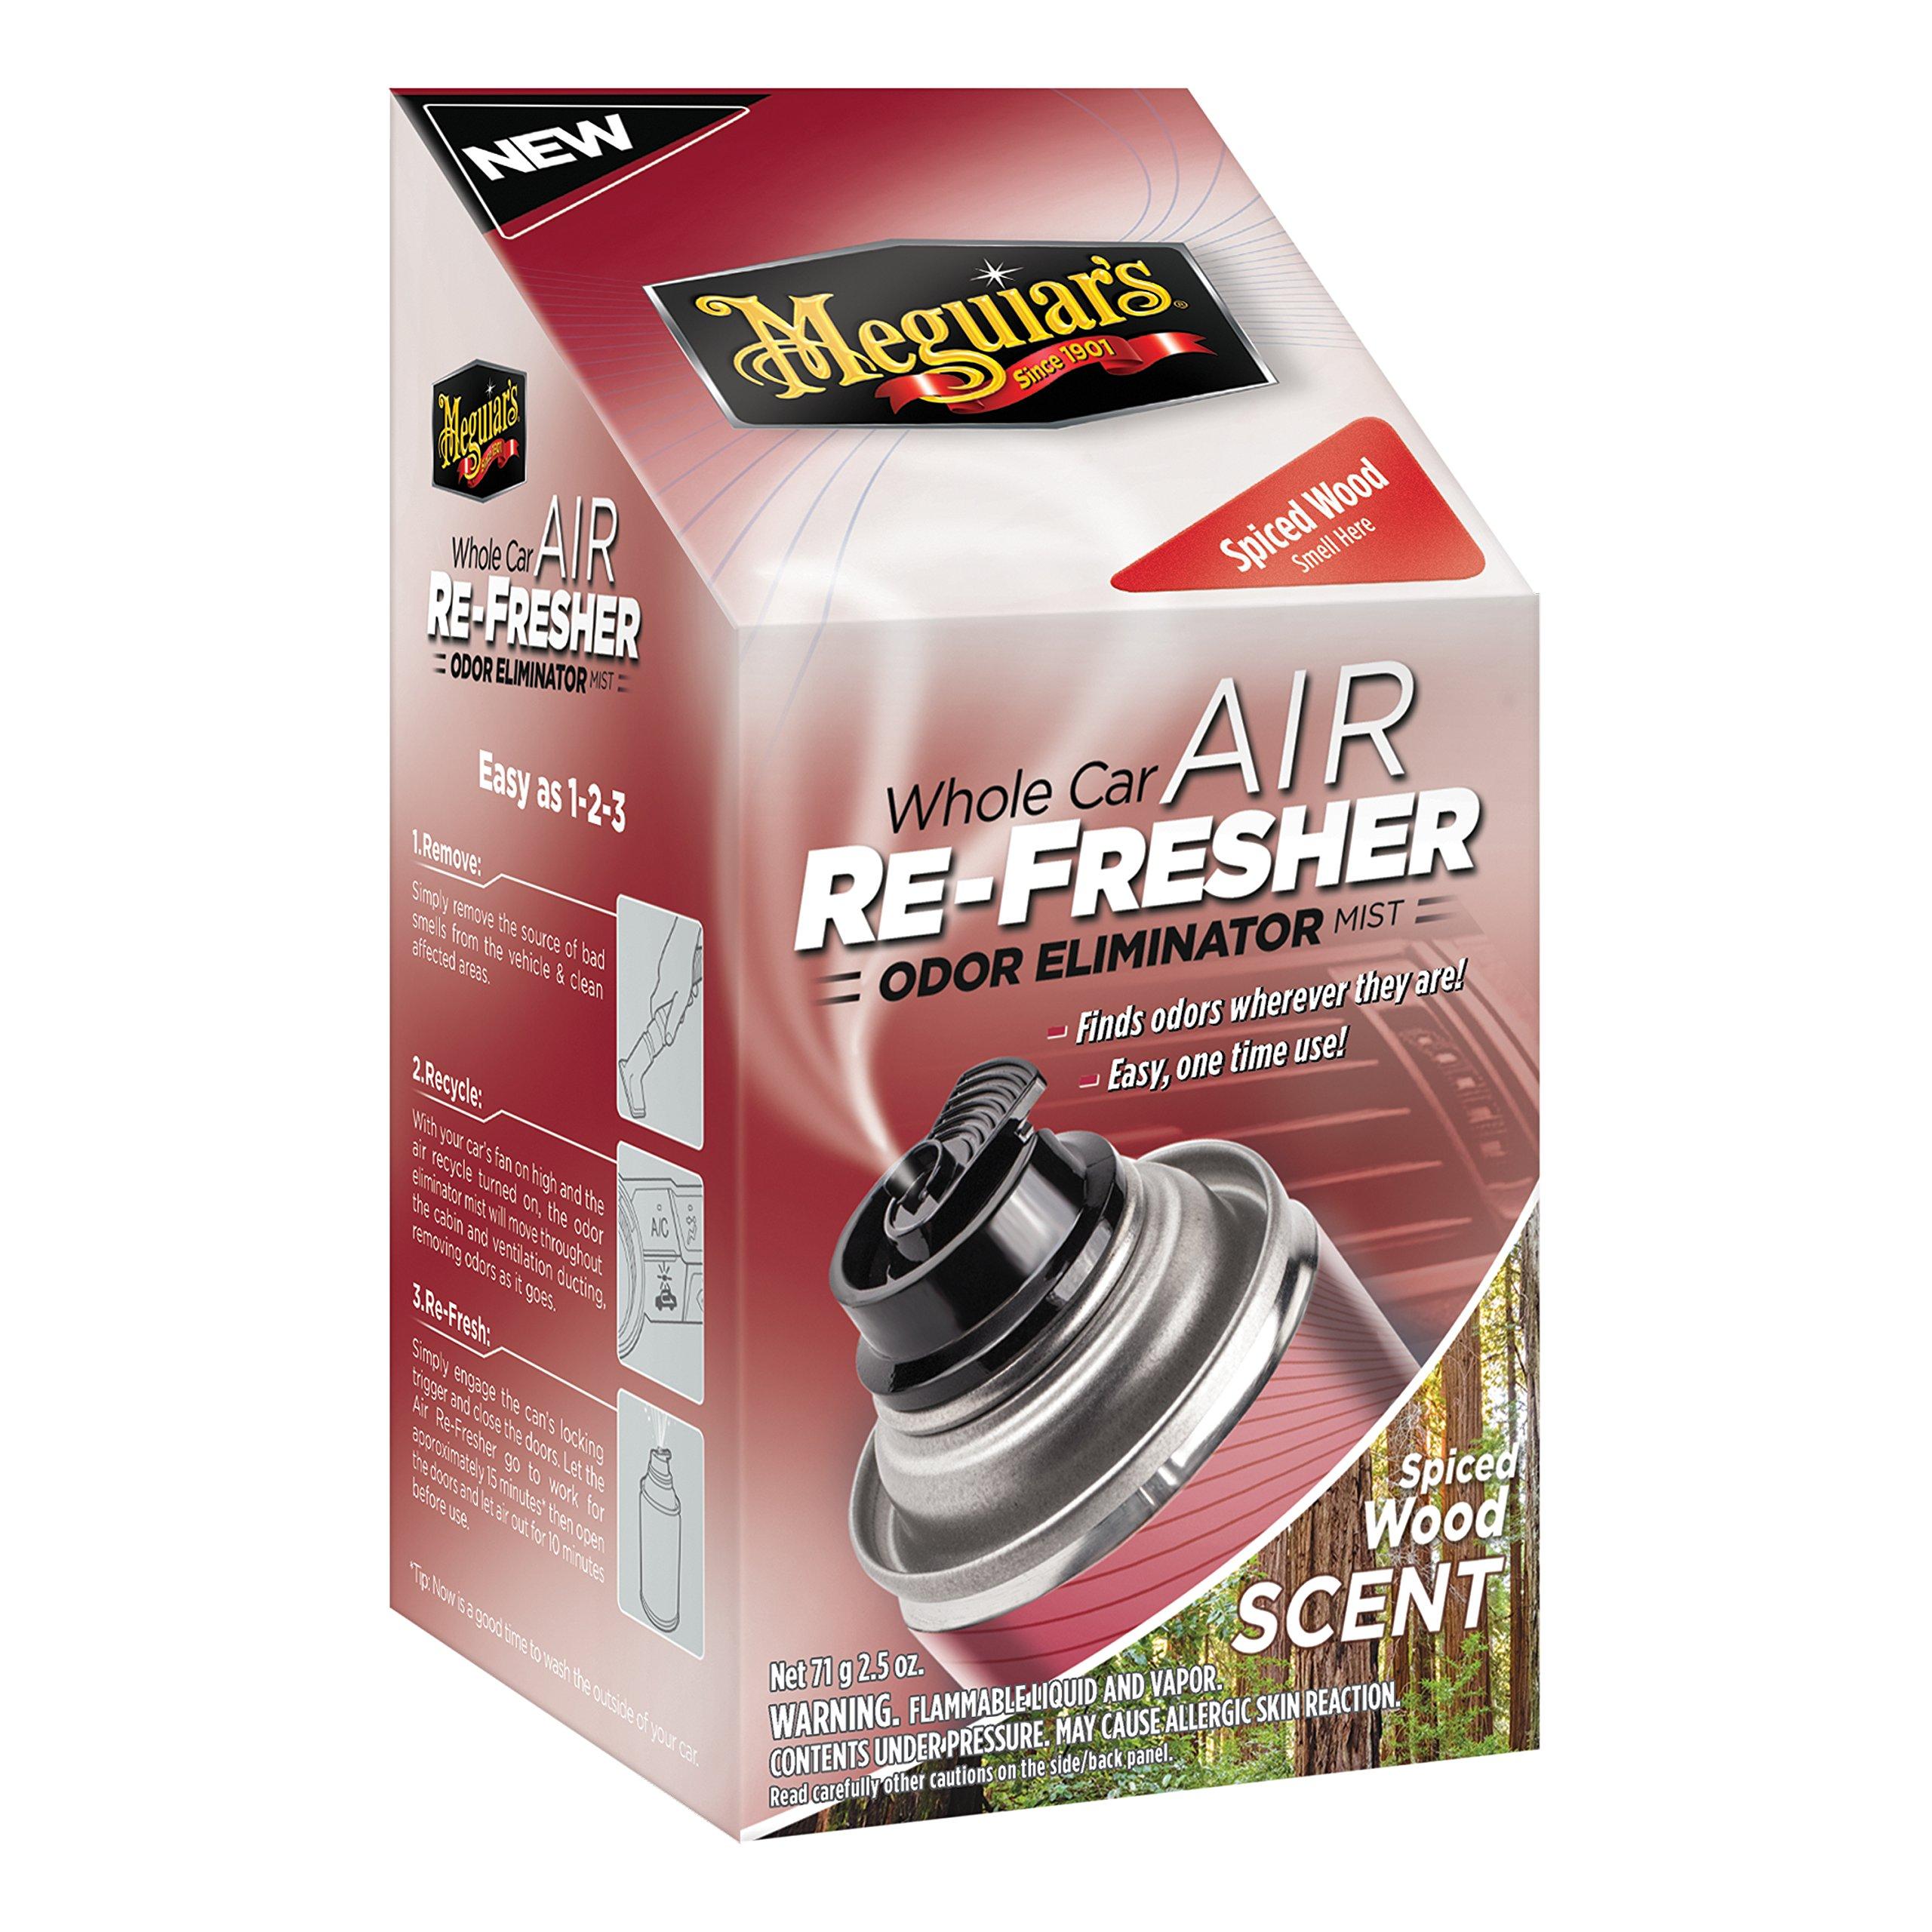 Meguiar's G19702 Whole Car Air Refresher Odor Eliminator (Spiced Wood Scent), 2.5 oz.